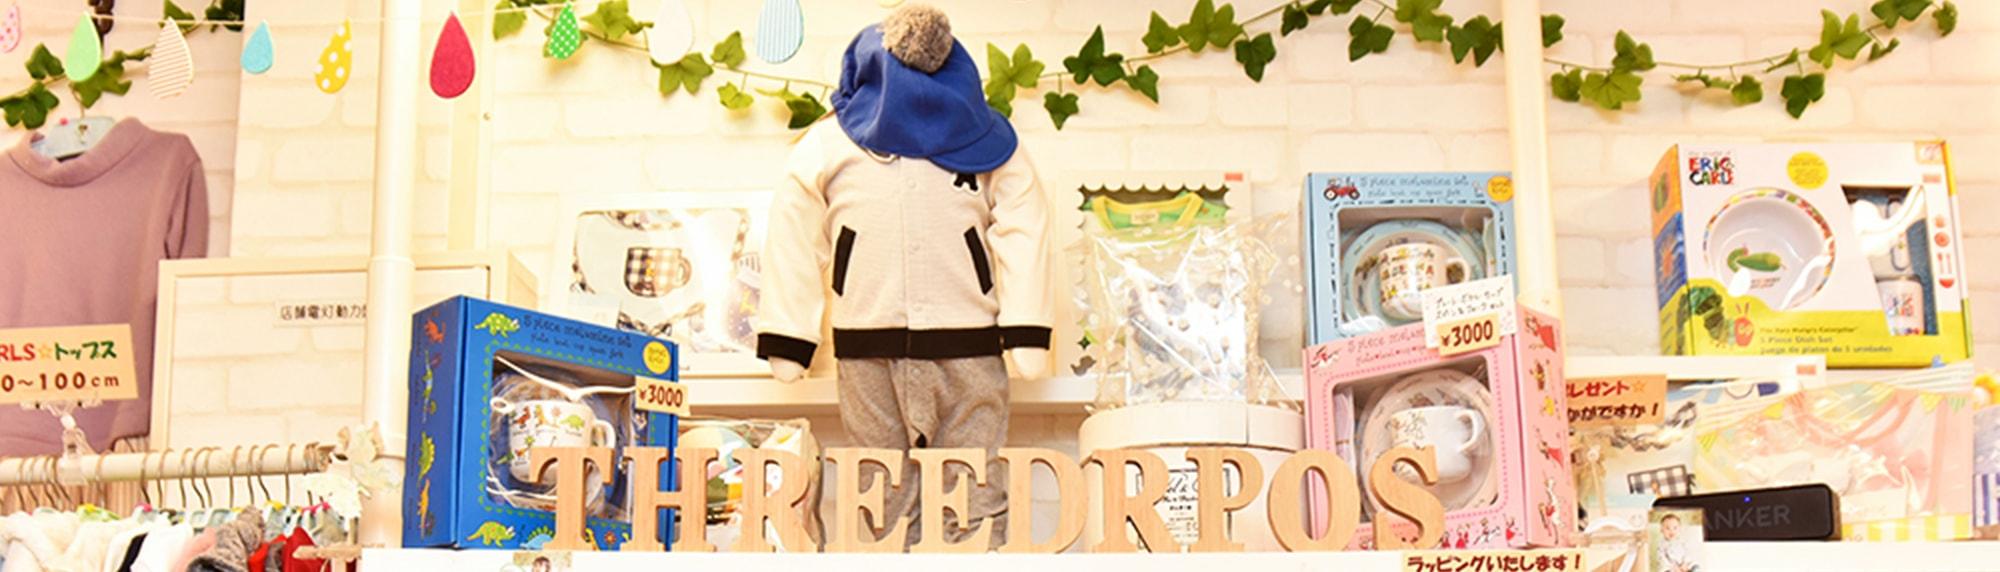 31a3da5e8843b 人形町で子供服を購入するなら「THREEDROPS」へ!